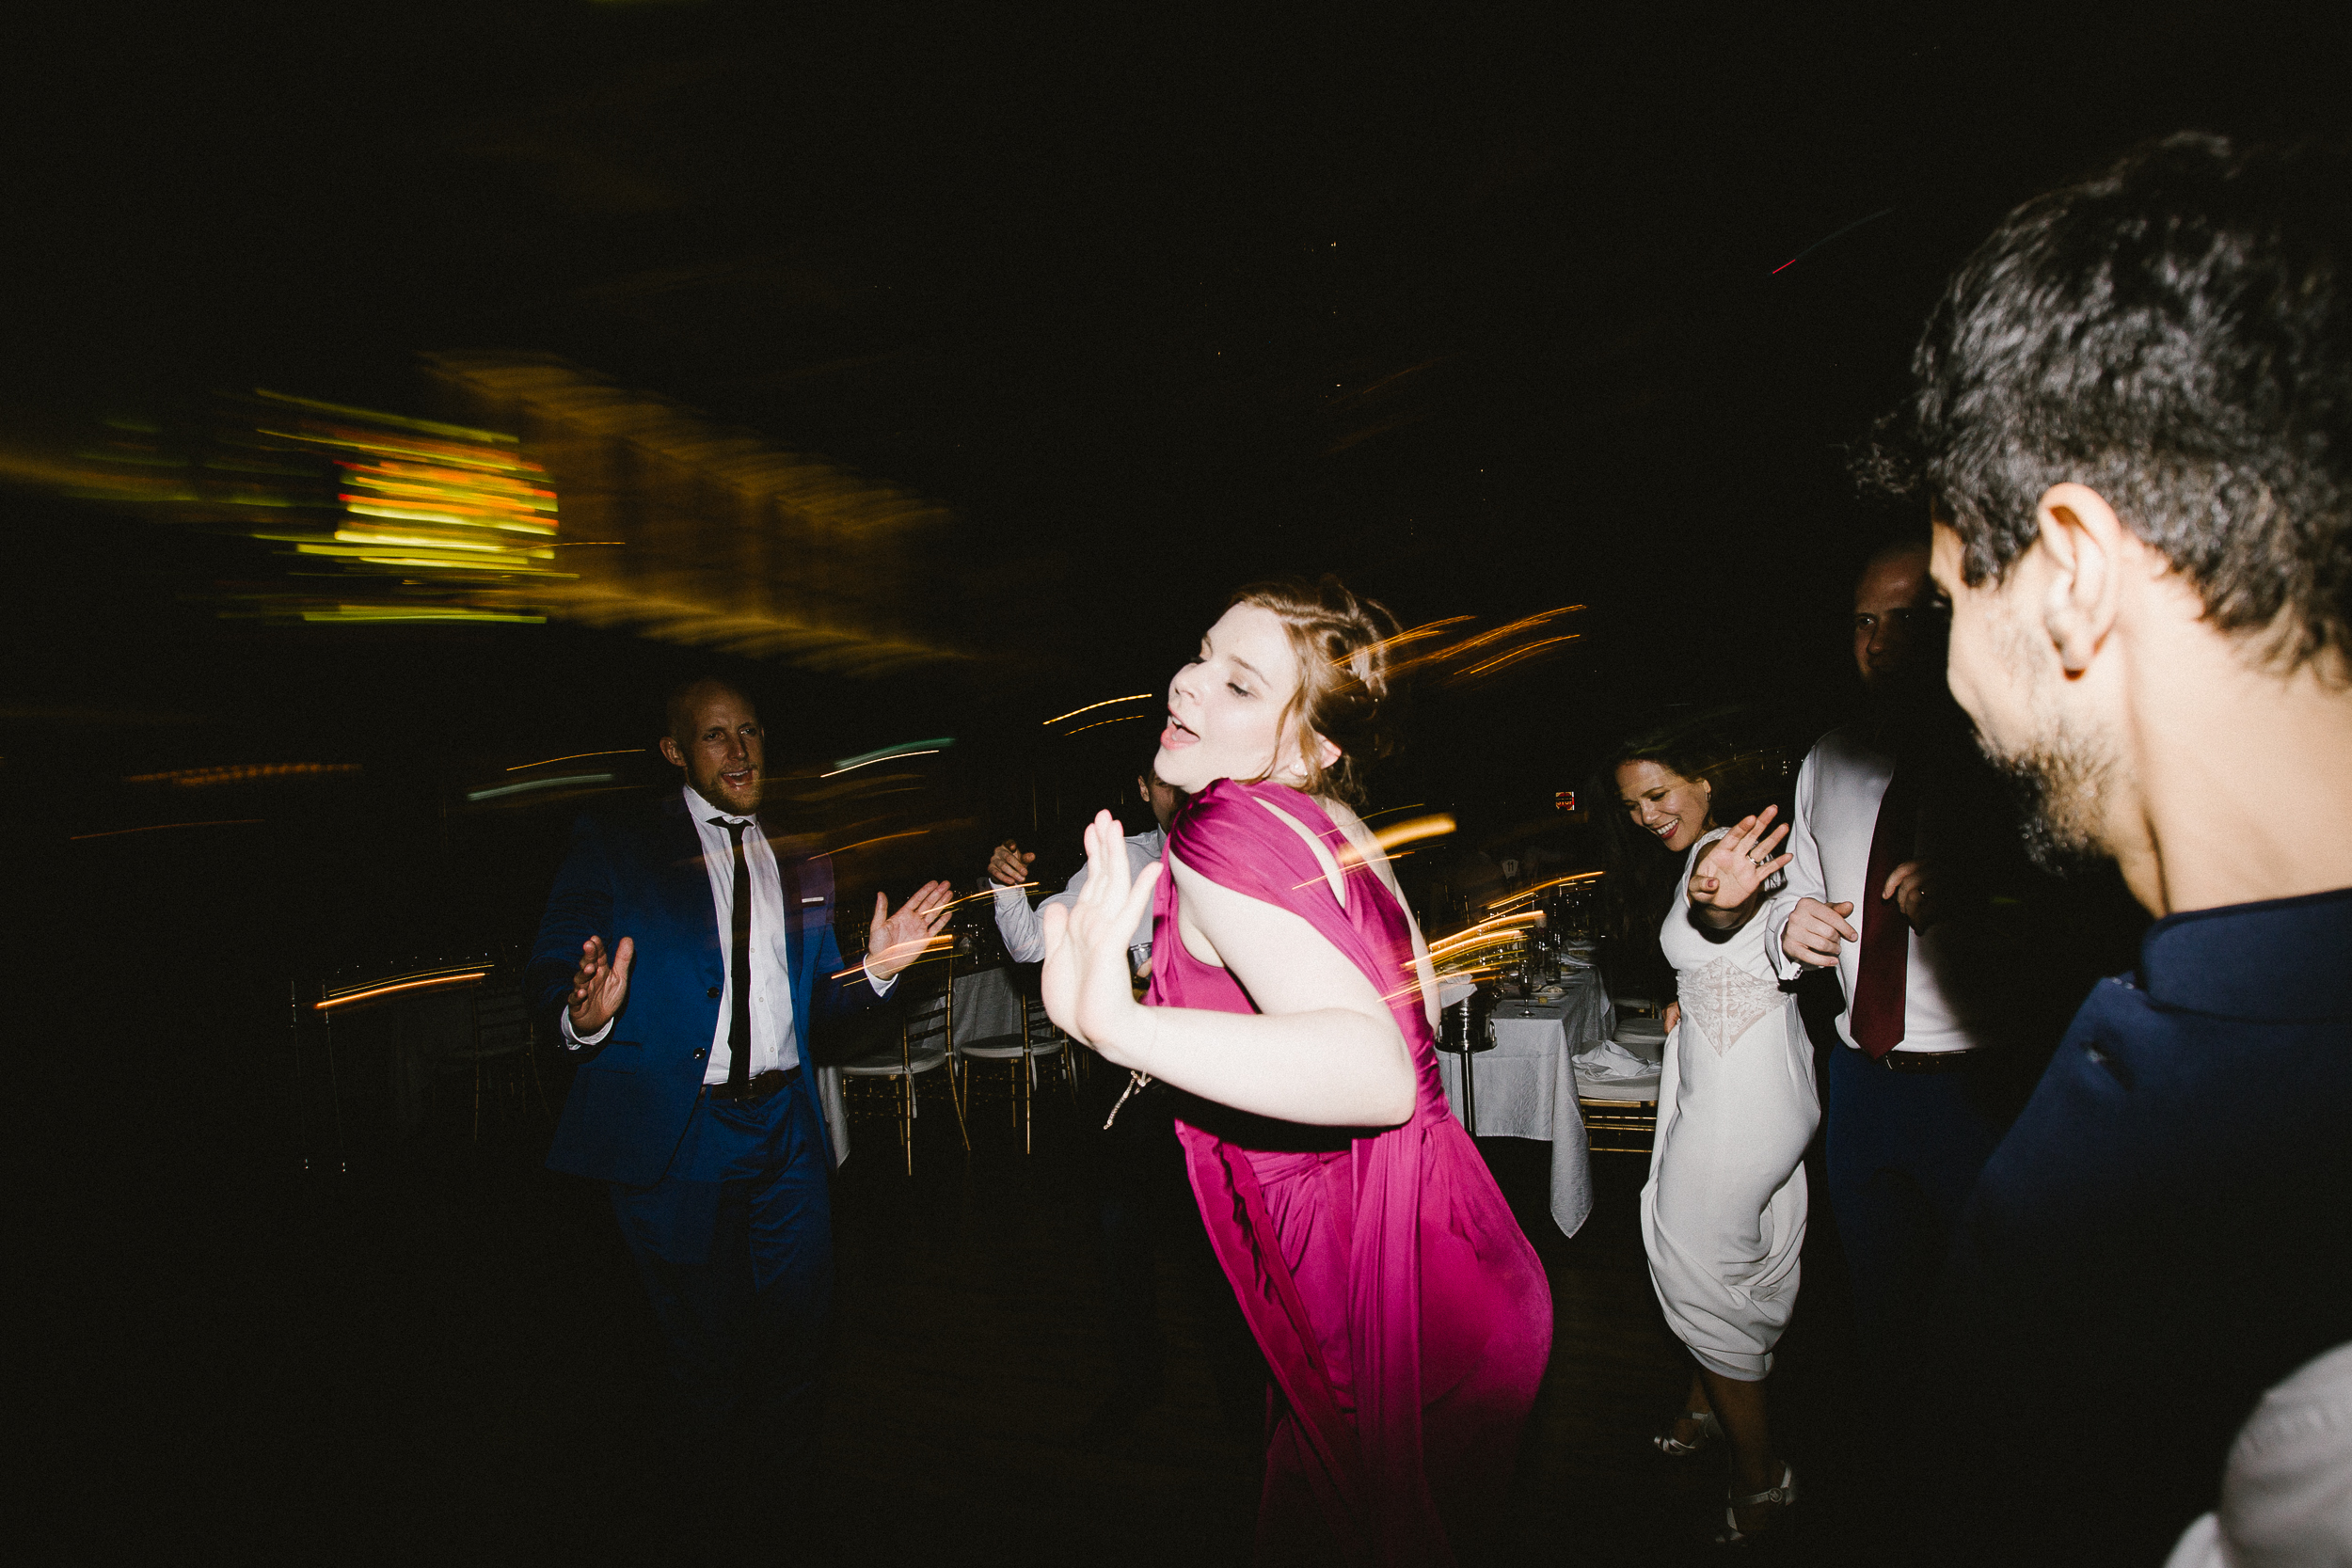 Singapore+Actual+Day+Wedding+Photographer+Raffles+Town+Club+Joseph+Ailee-0093.jpg